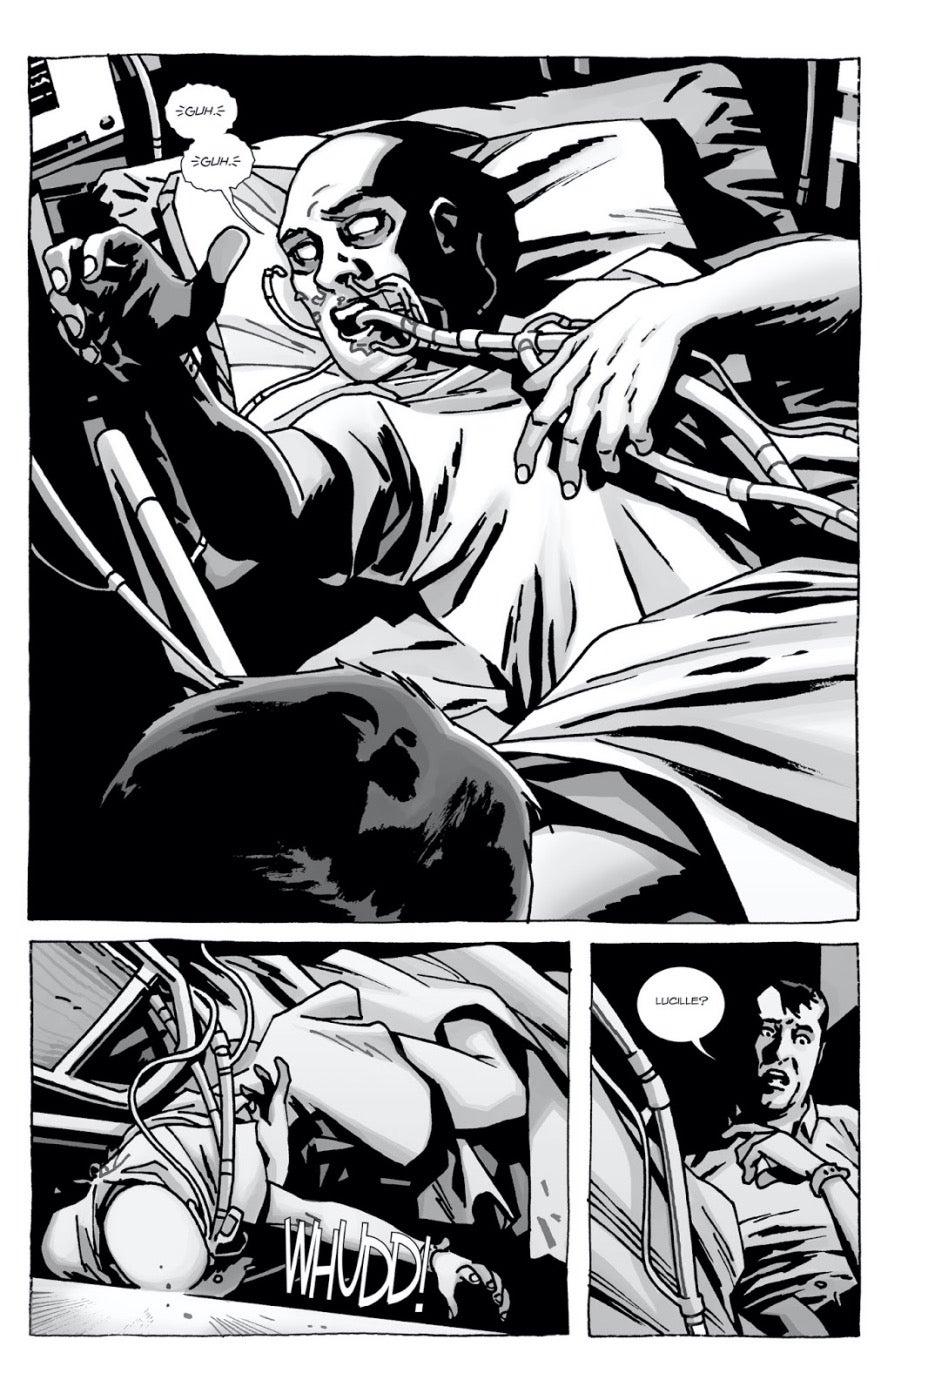 Here's Negan comics Lucille dies